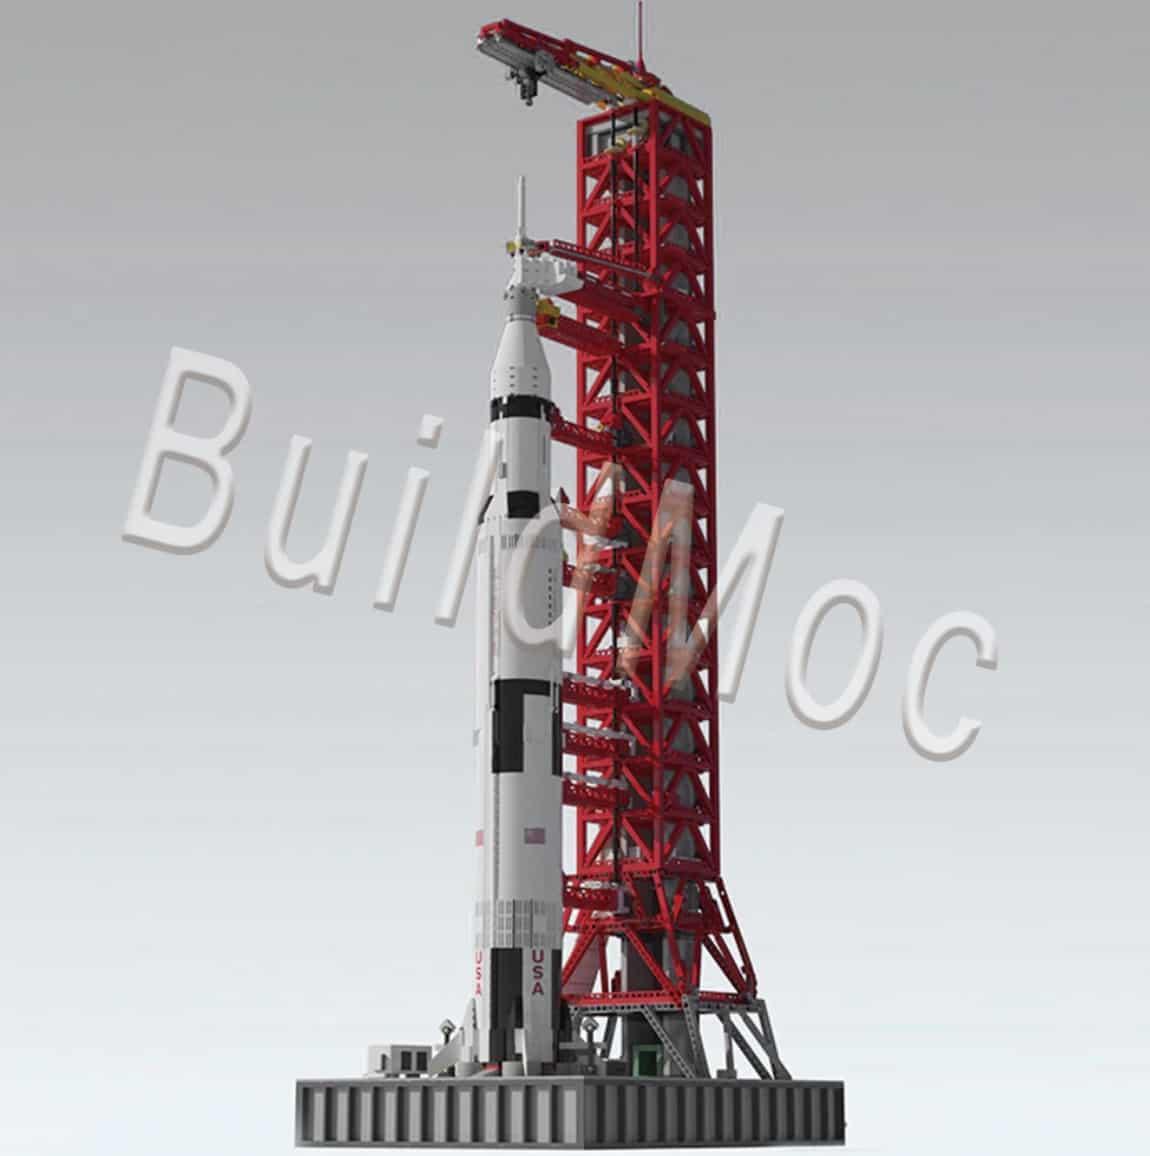 Best AliExpress Lego Replica Top Lego Alternative Cheap Lego Clone BuildMoc Store Saturn V Apollo Moon Rocket Stand